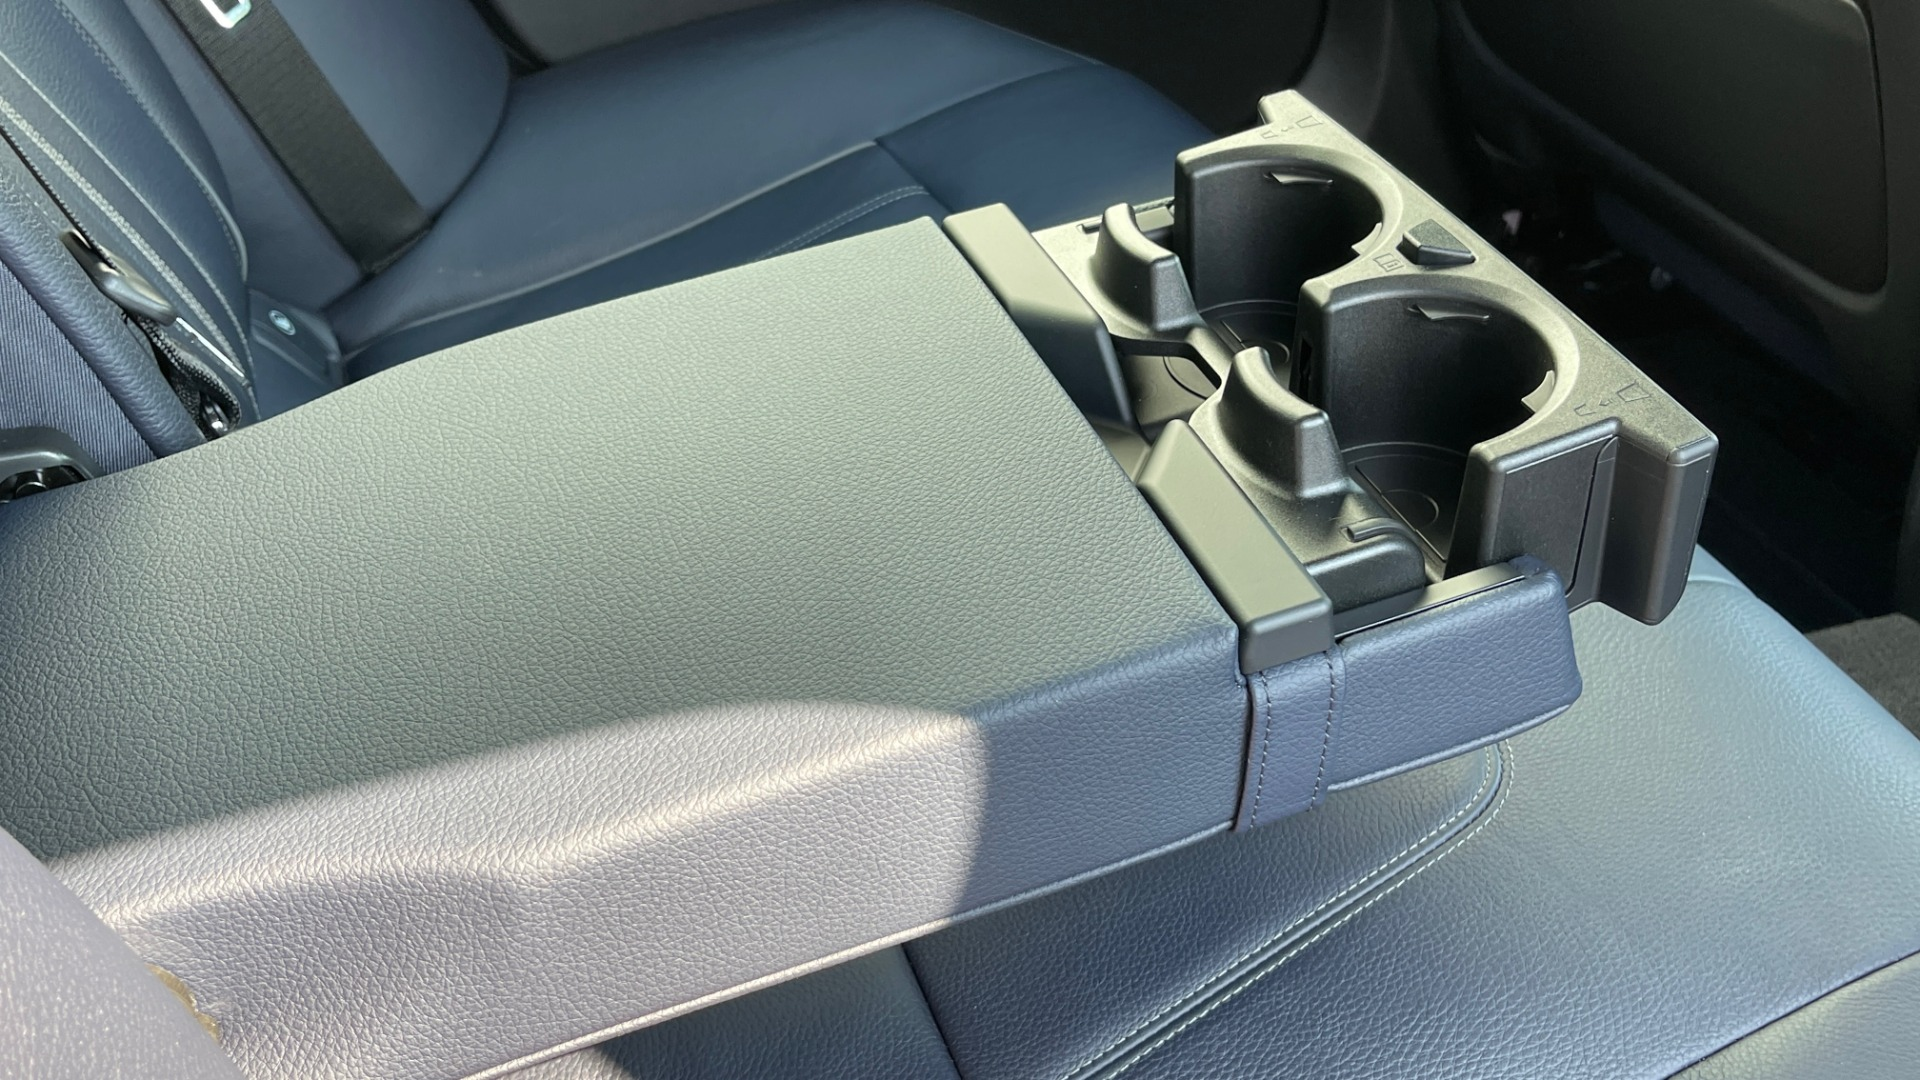 Used 2018 BMW 5 SERIES 540I XDRIVE M-SPORT / DRVR ASST / PDC / APPLE / HUD / H/K SND for sale $42,795 at Formula Imports in Charlotte NC 28227 62